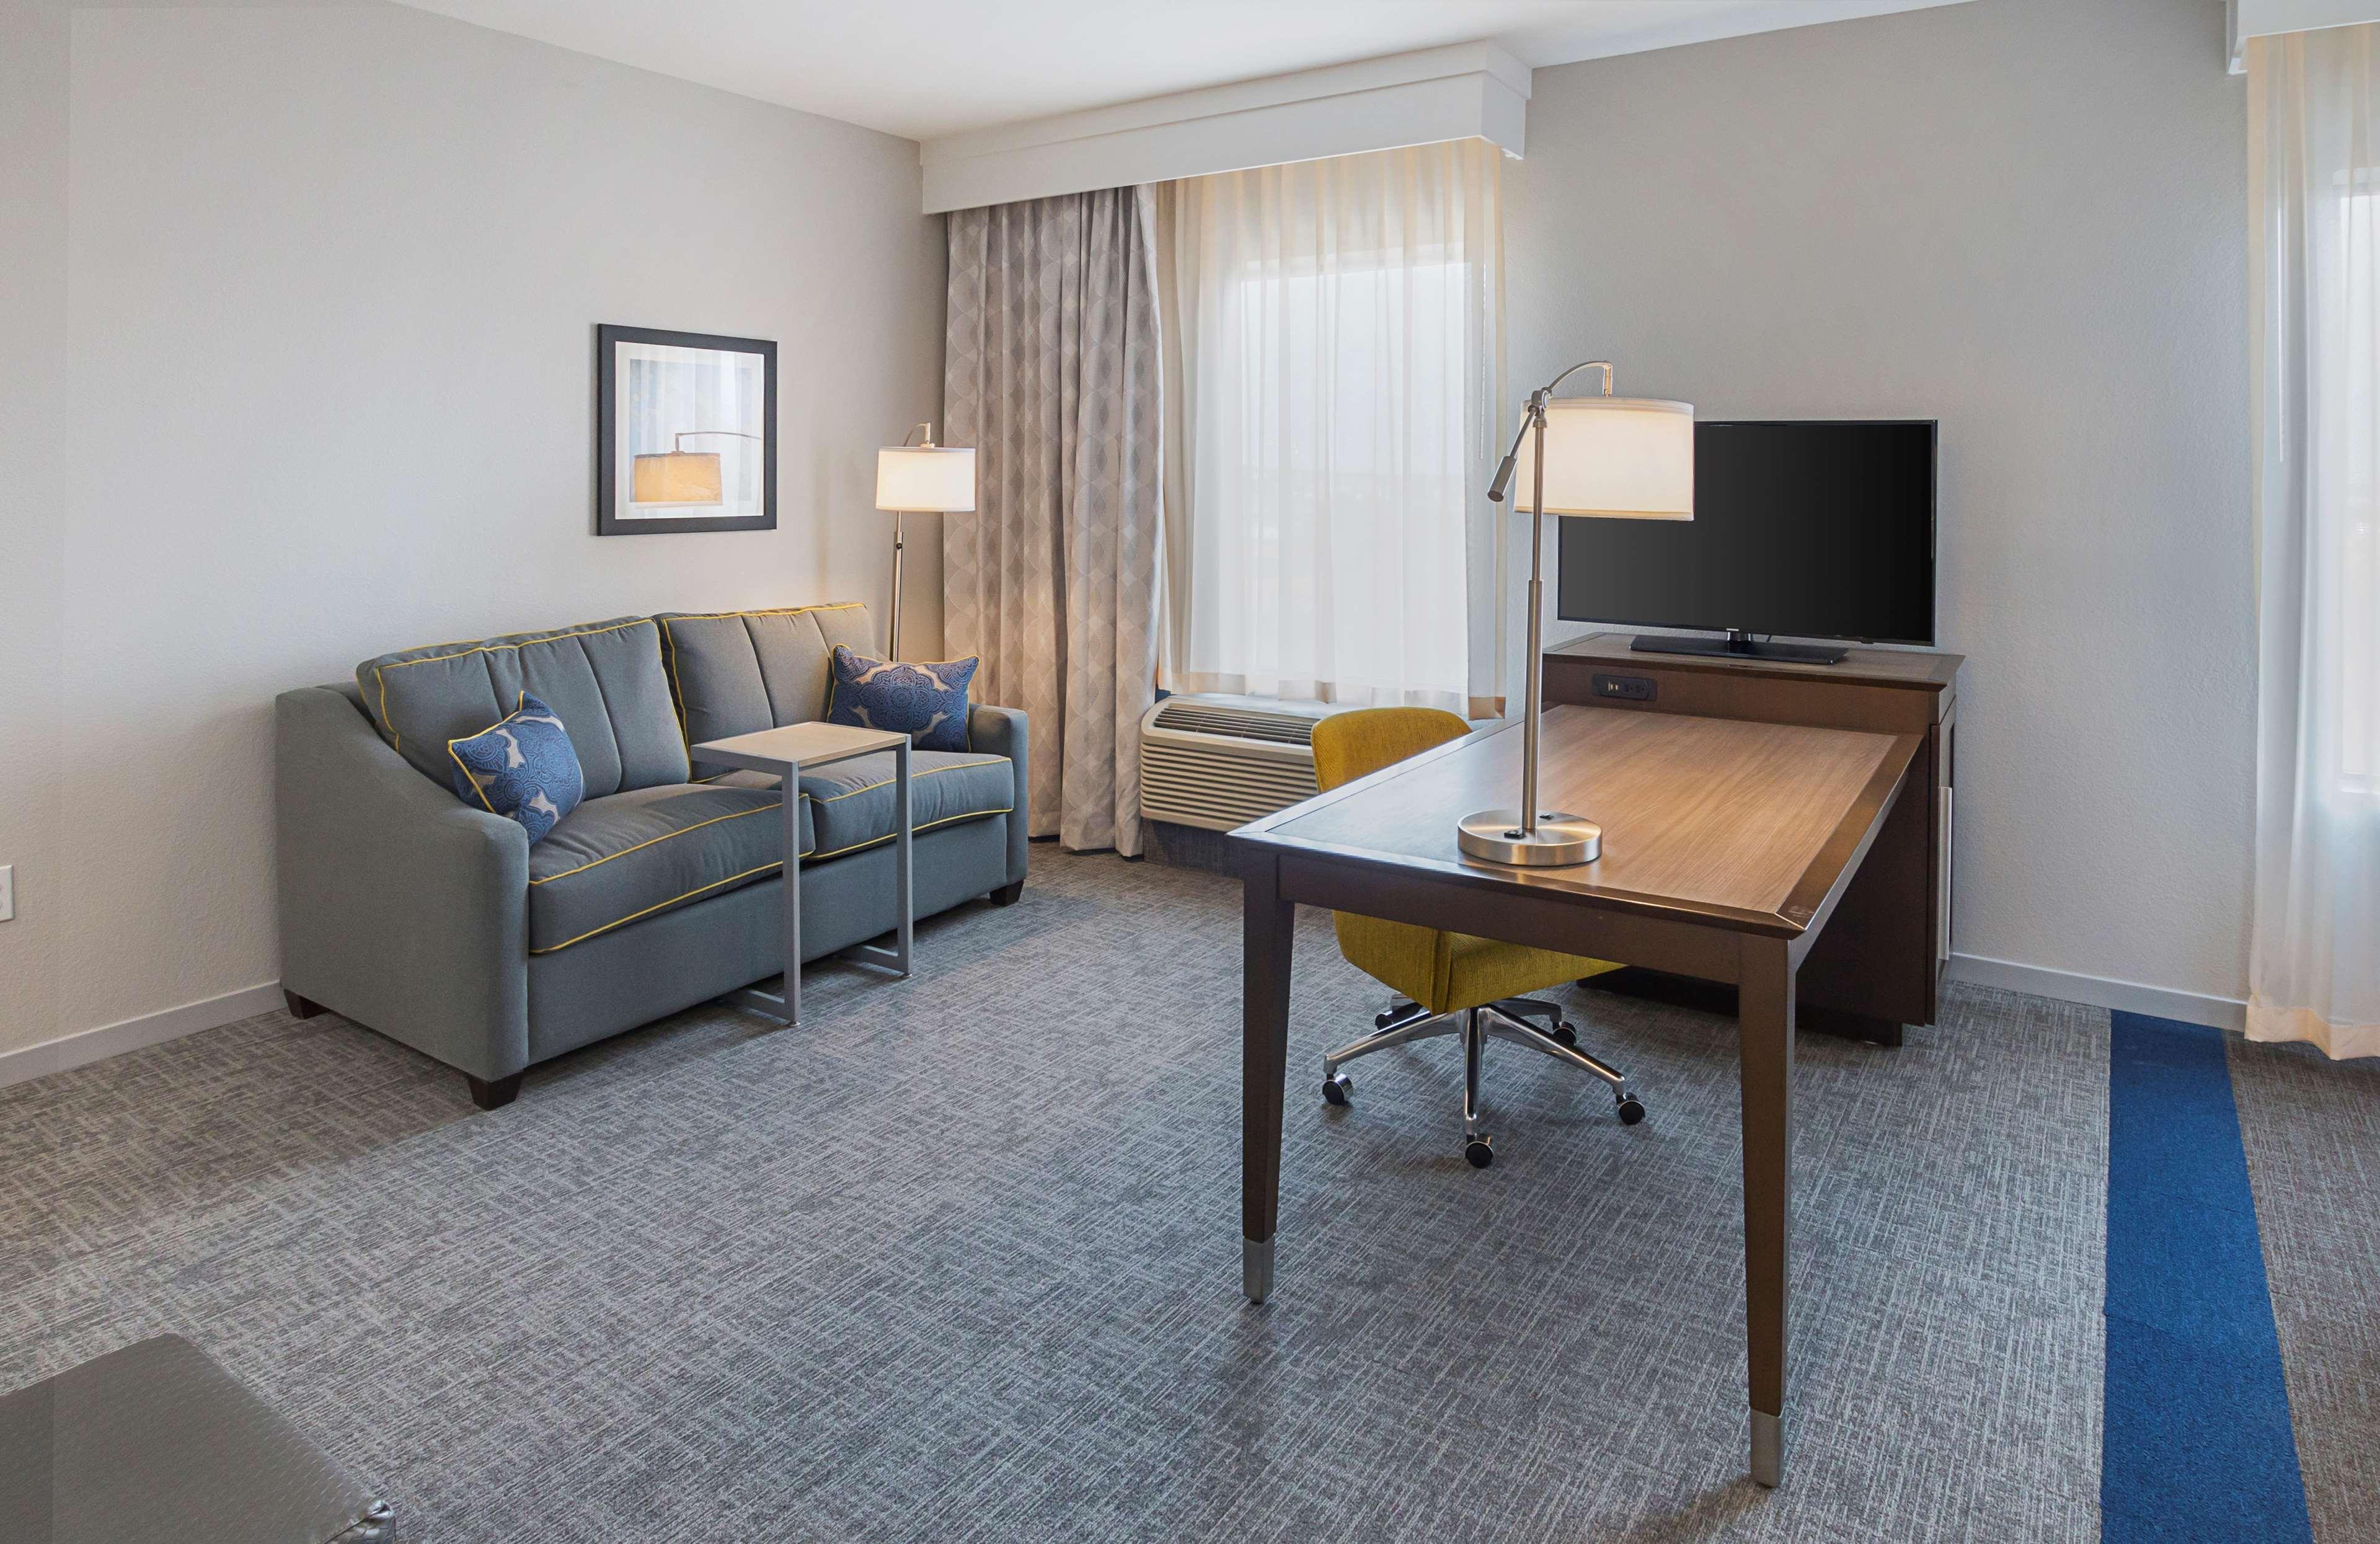 Hampton Inn & Suites Colleyville DFW West image 39